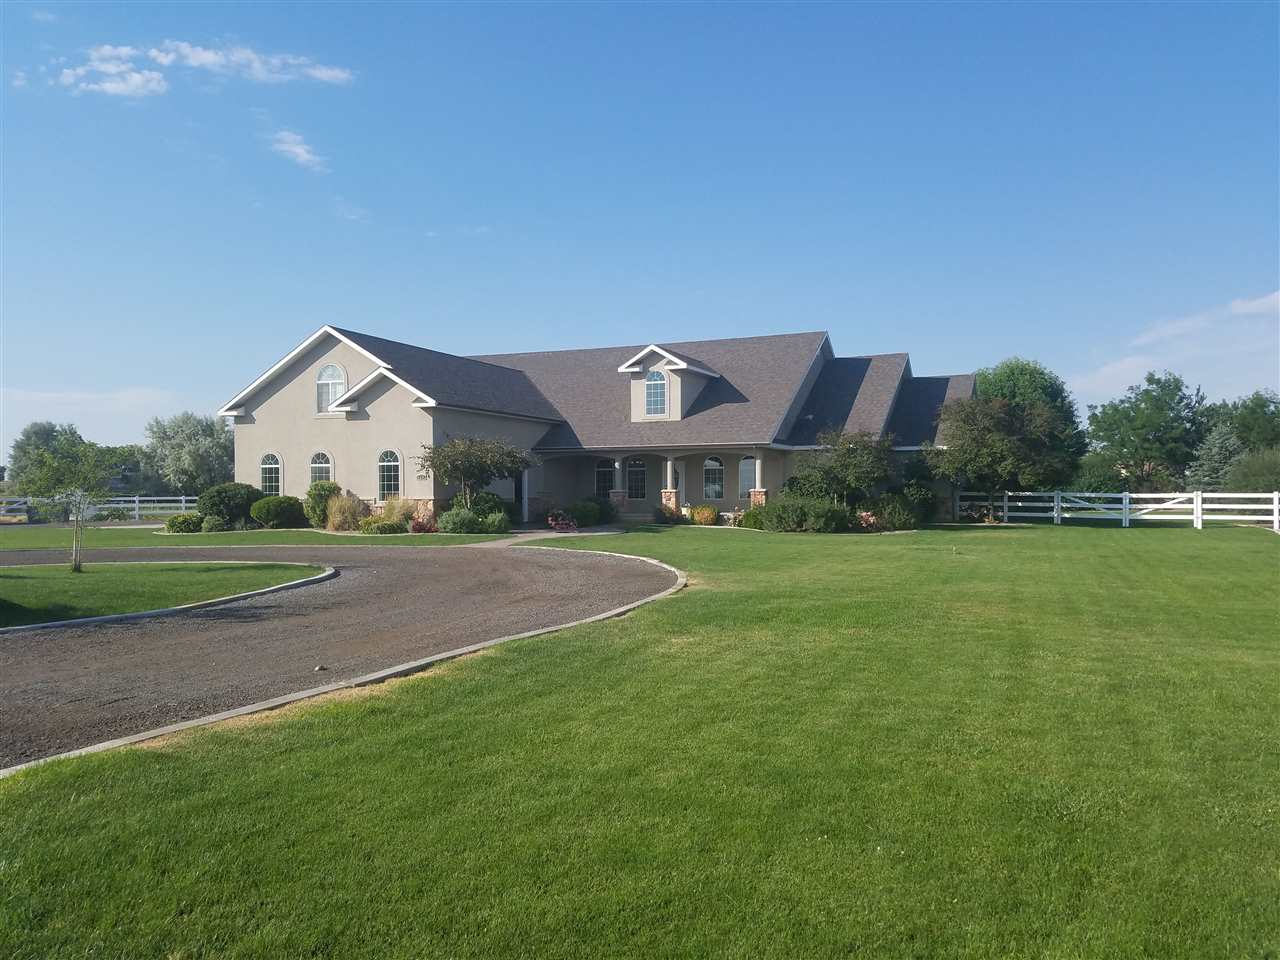 Single Family Home for Sale at 428 Pheasant Road 428 Pheasant Road Jerome, Idaho 83338